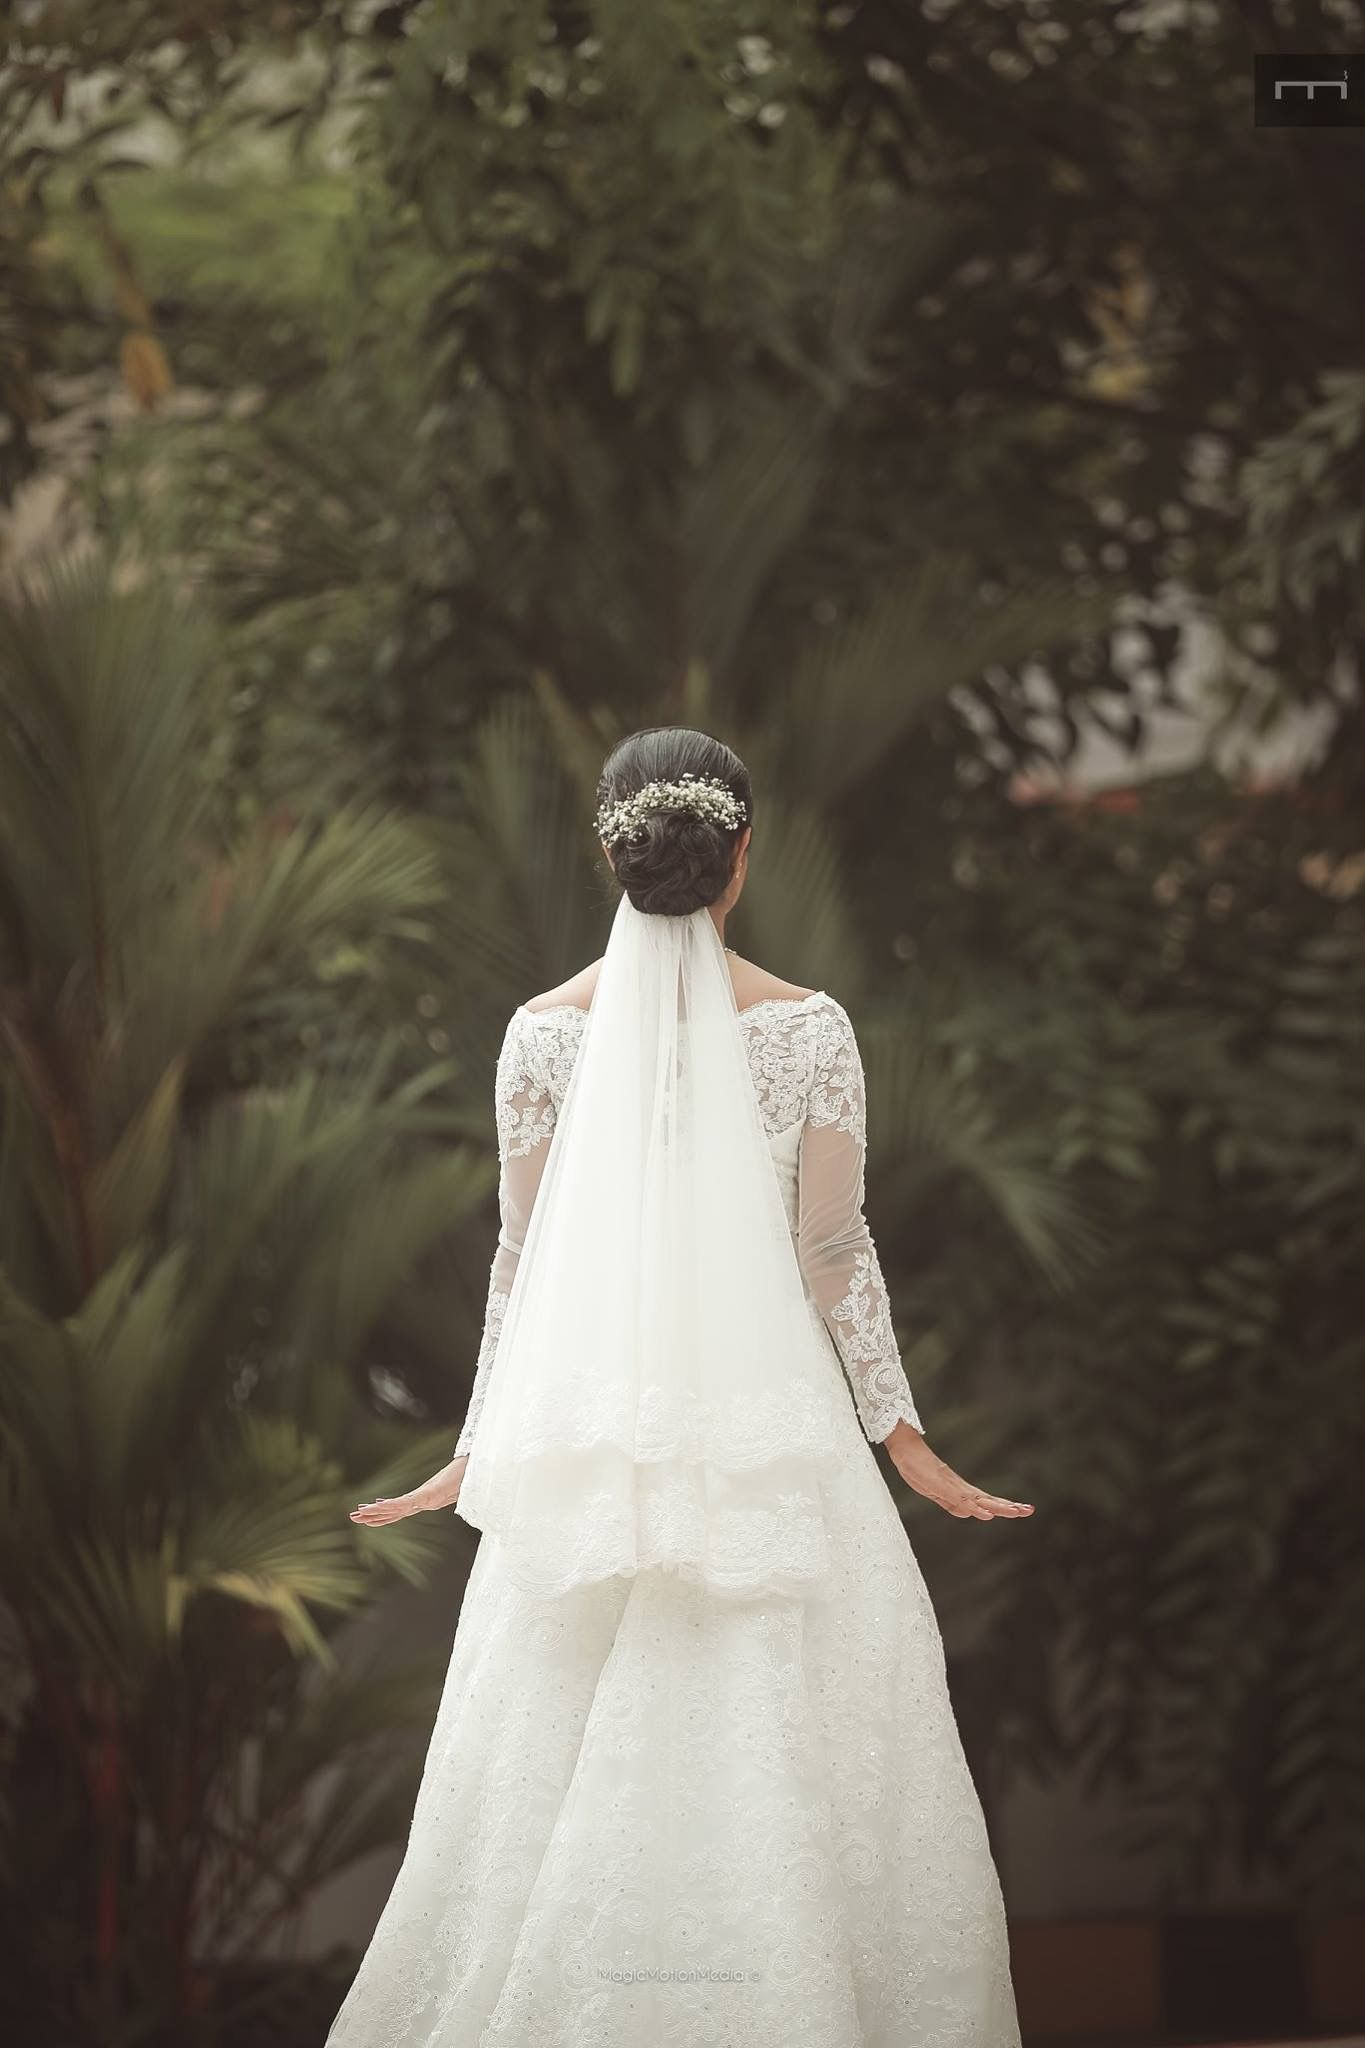 Beach wedding pre shoot  Pin by Noreen Thomas on WeddingHues  Pinterest